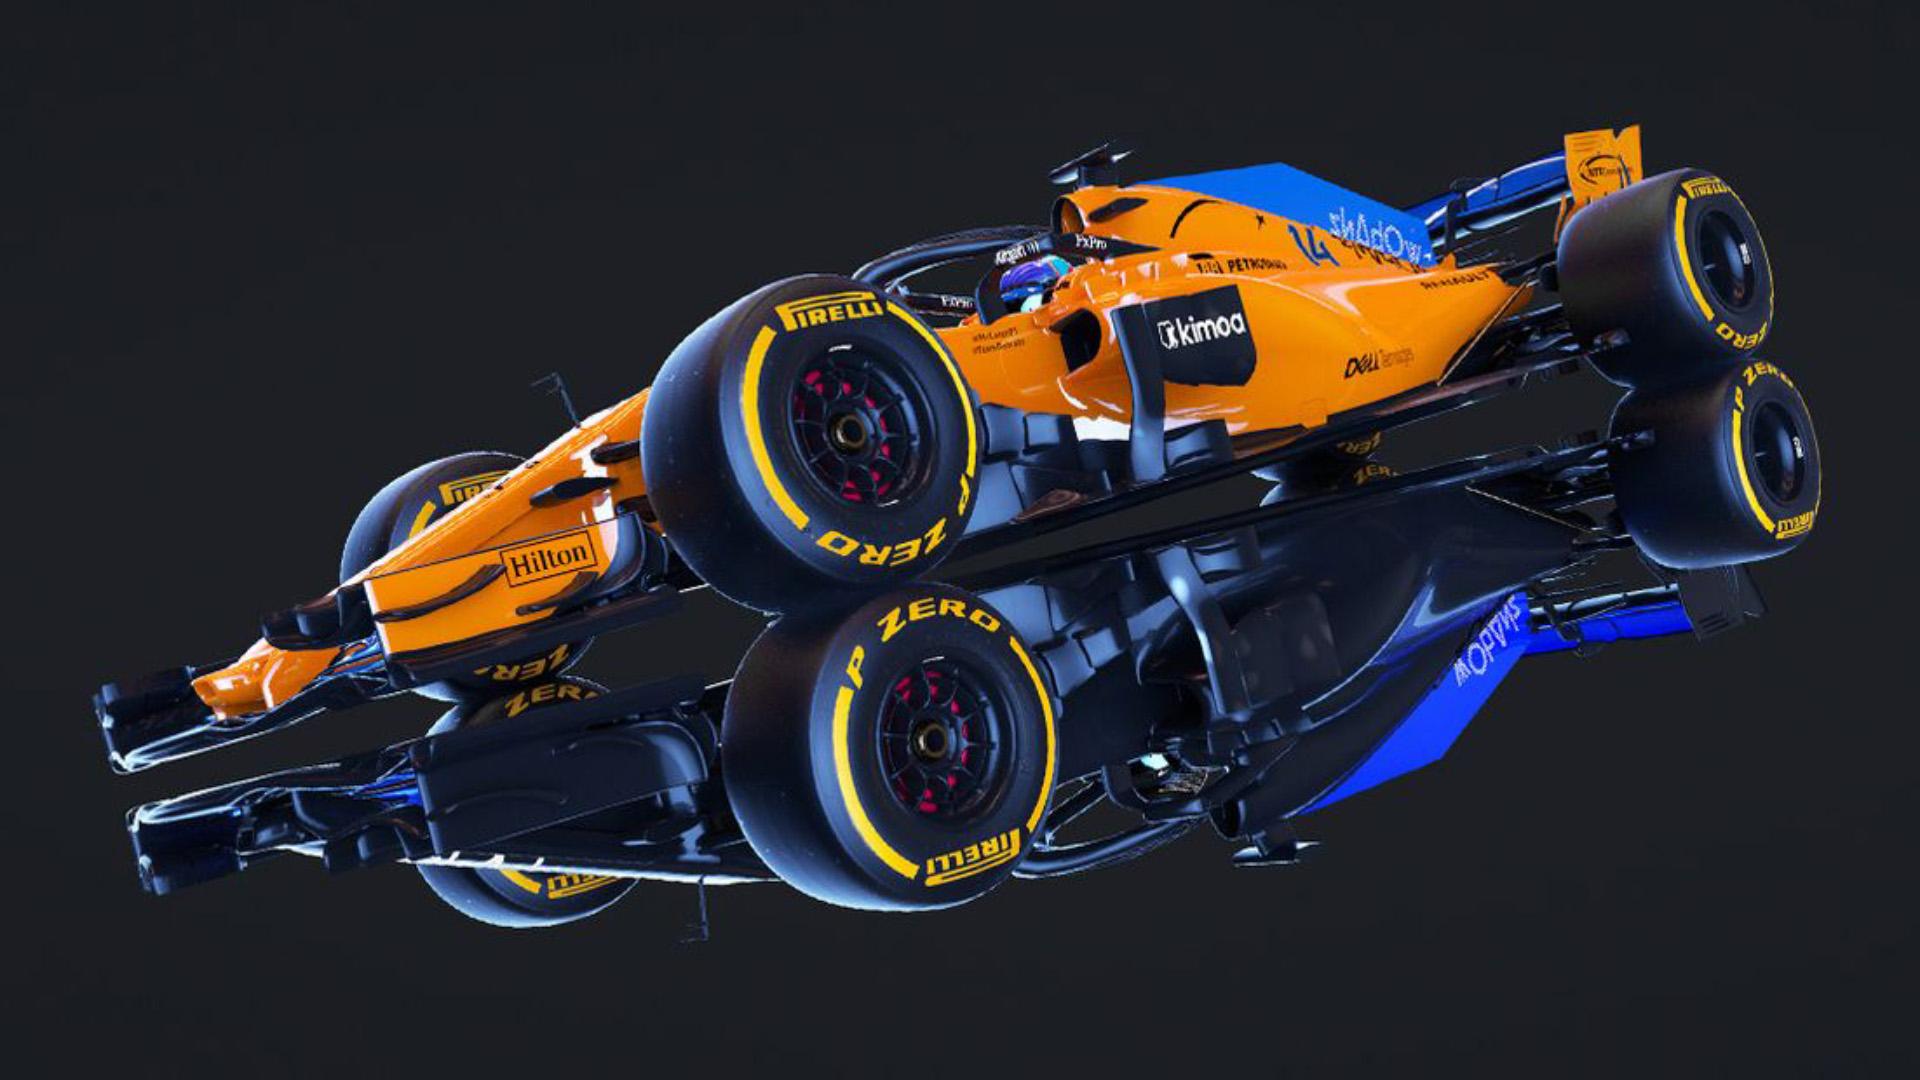 McLaren Racing & Garena announce new collaboration